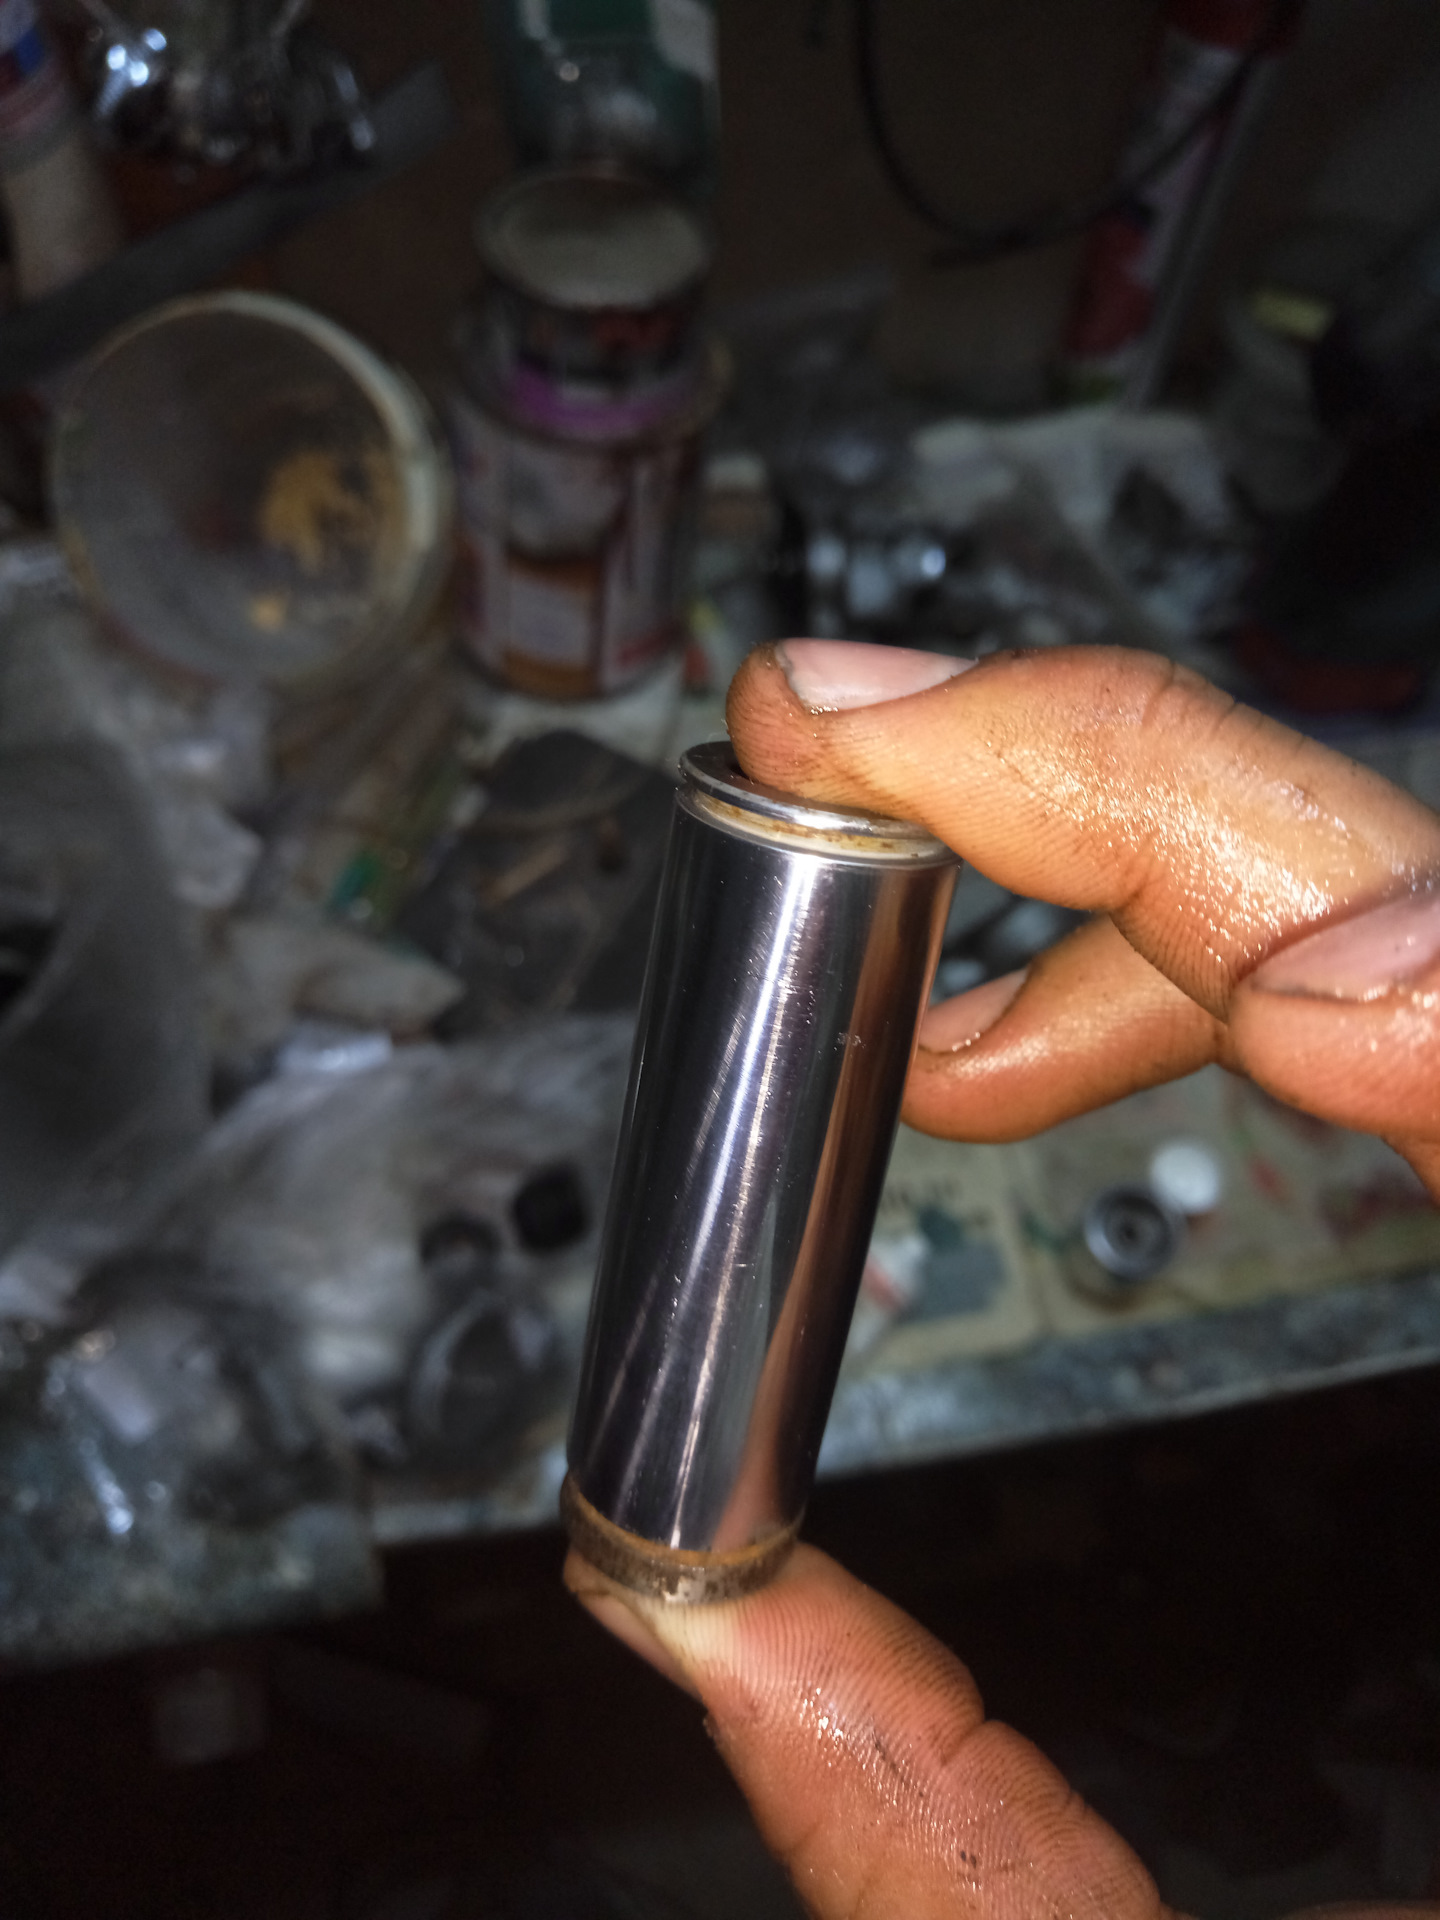 ситроен xsara ремонт суппортов